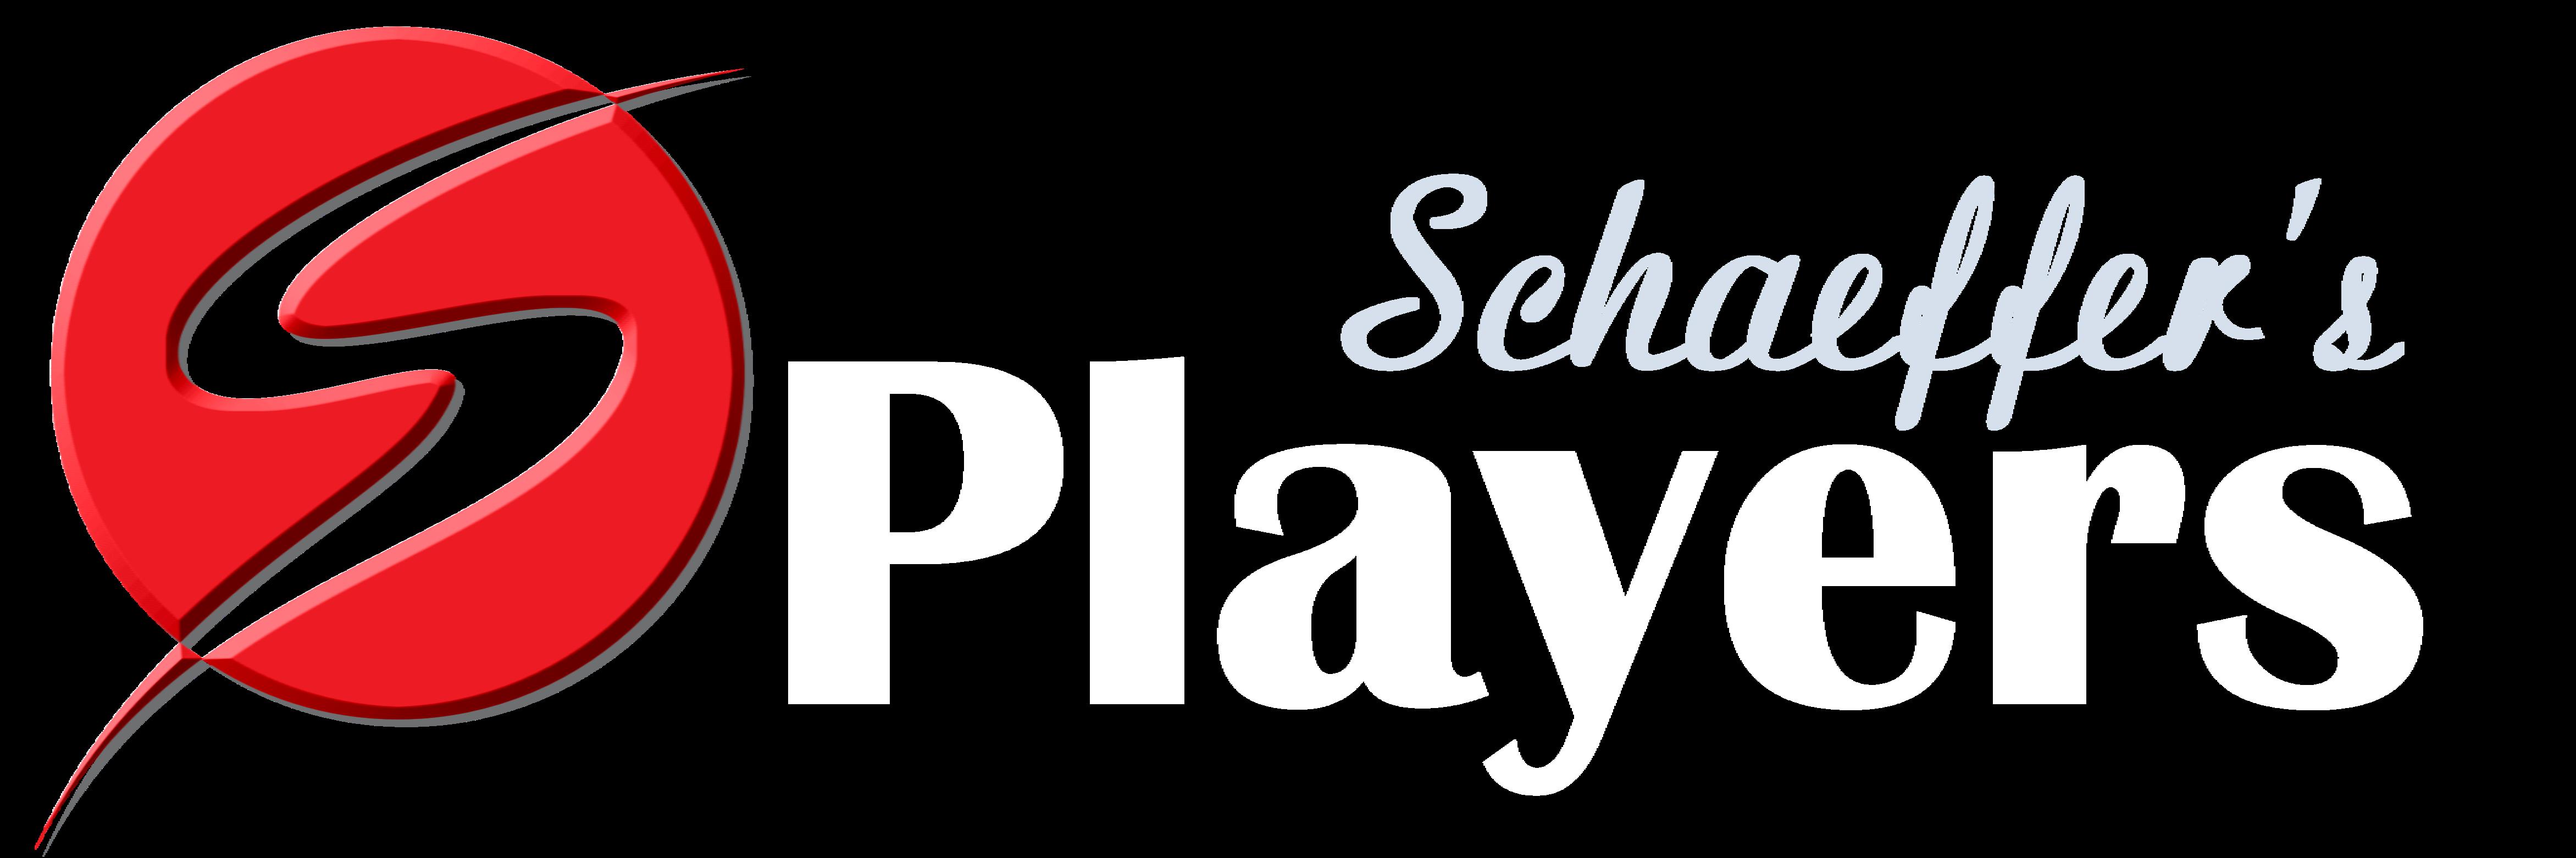 PLAY STLD 10-20